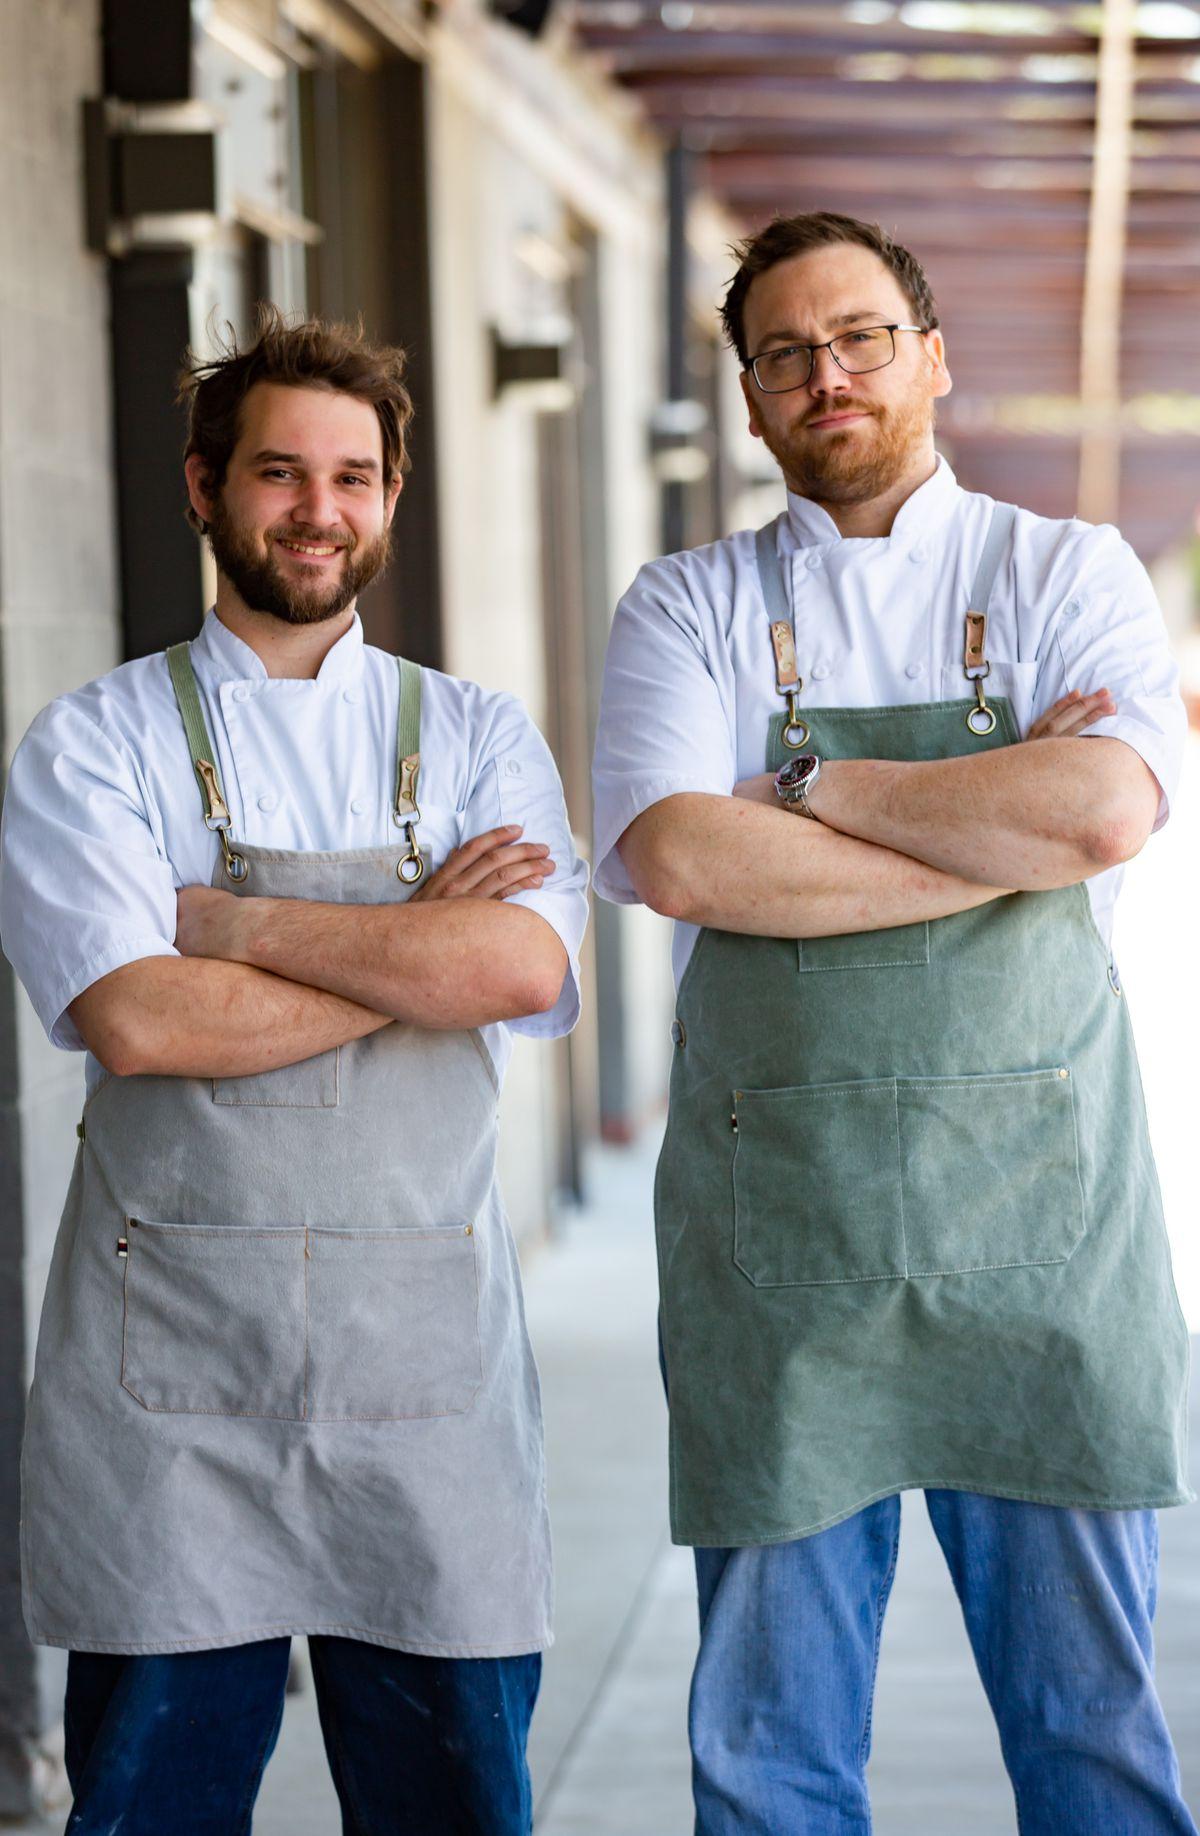 Chefs James Semanisin and Byars Parham, owners of Pomodoro Bella